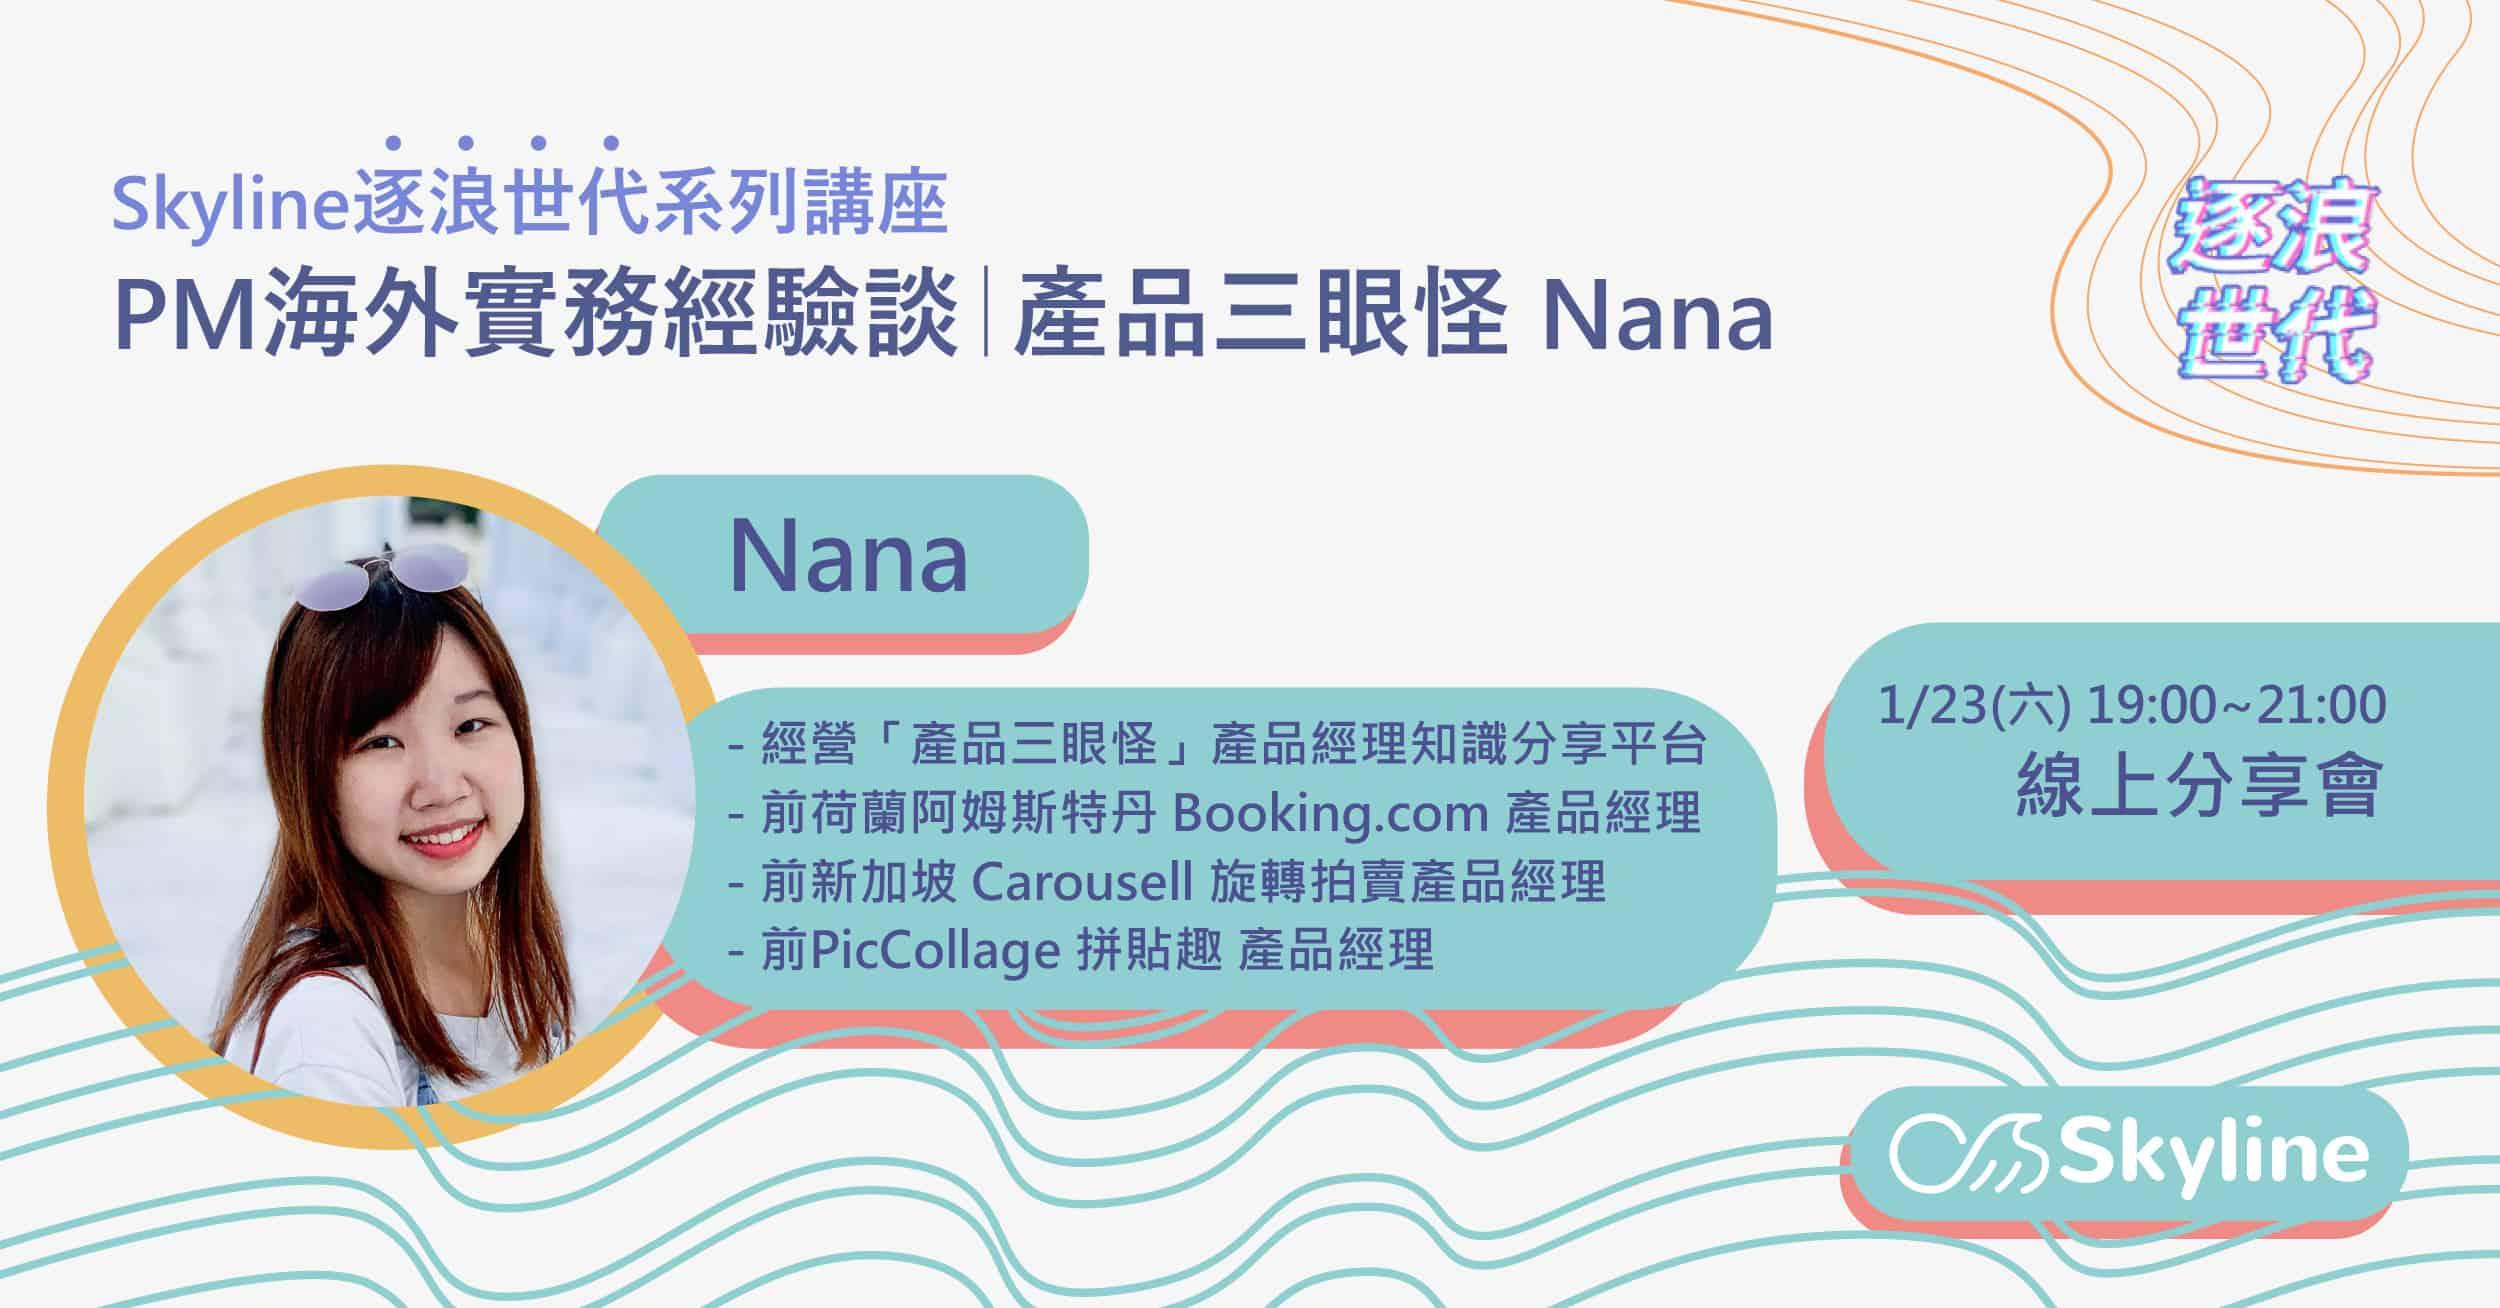 Skyline 逐浪世代|PM海外實務經驗談|產品三眼怪 Nana Chiang